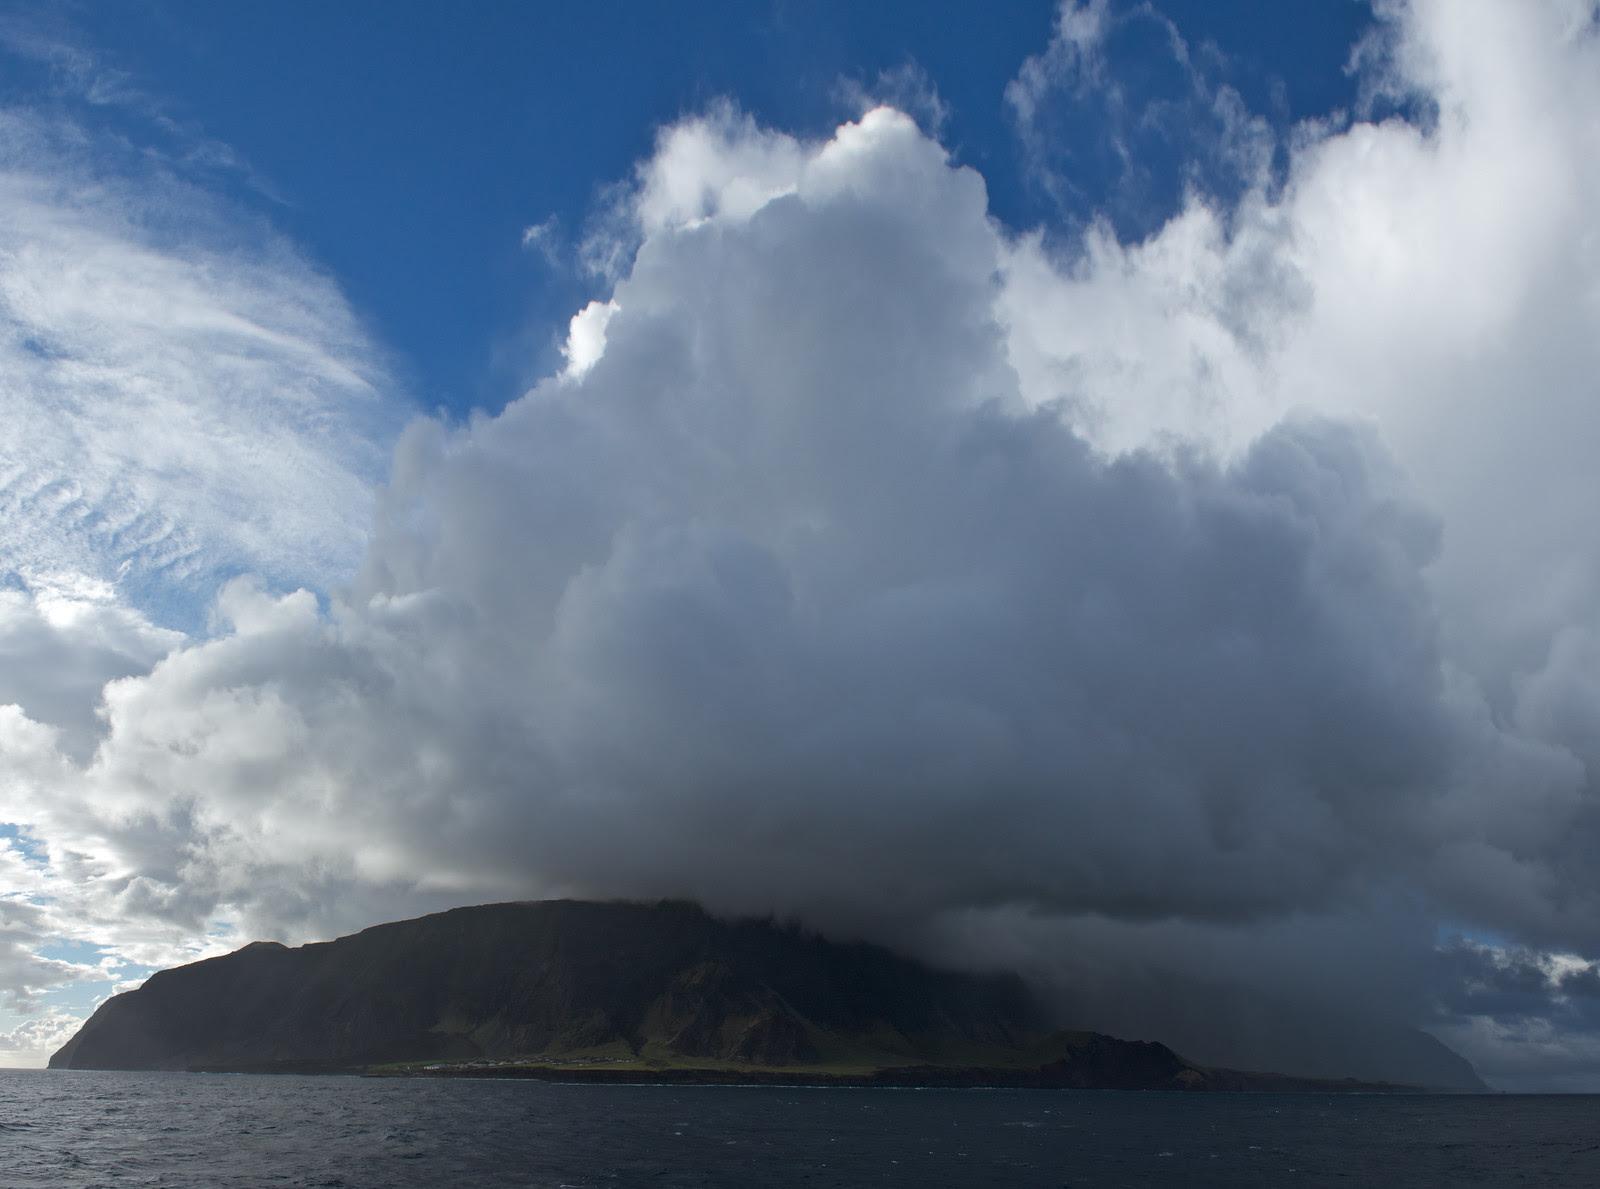 Storm clouds gather over Tristan da Cunha